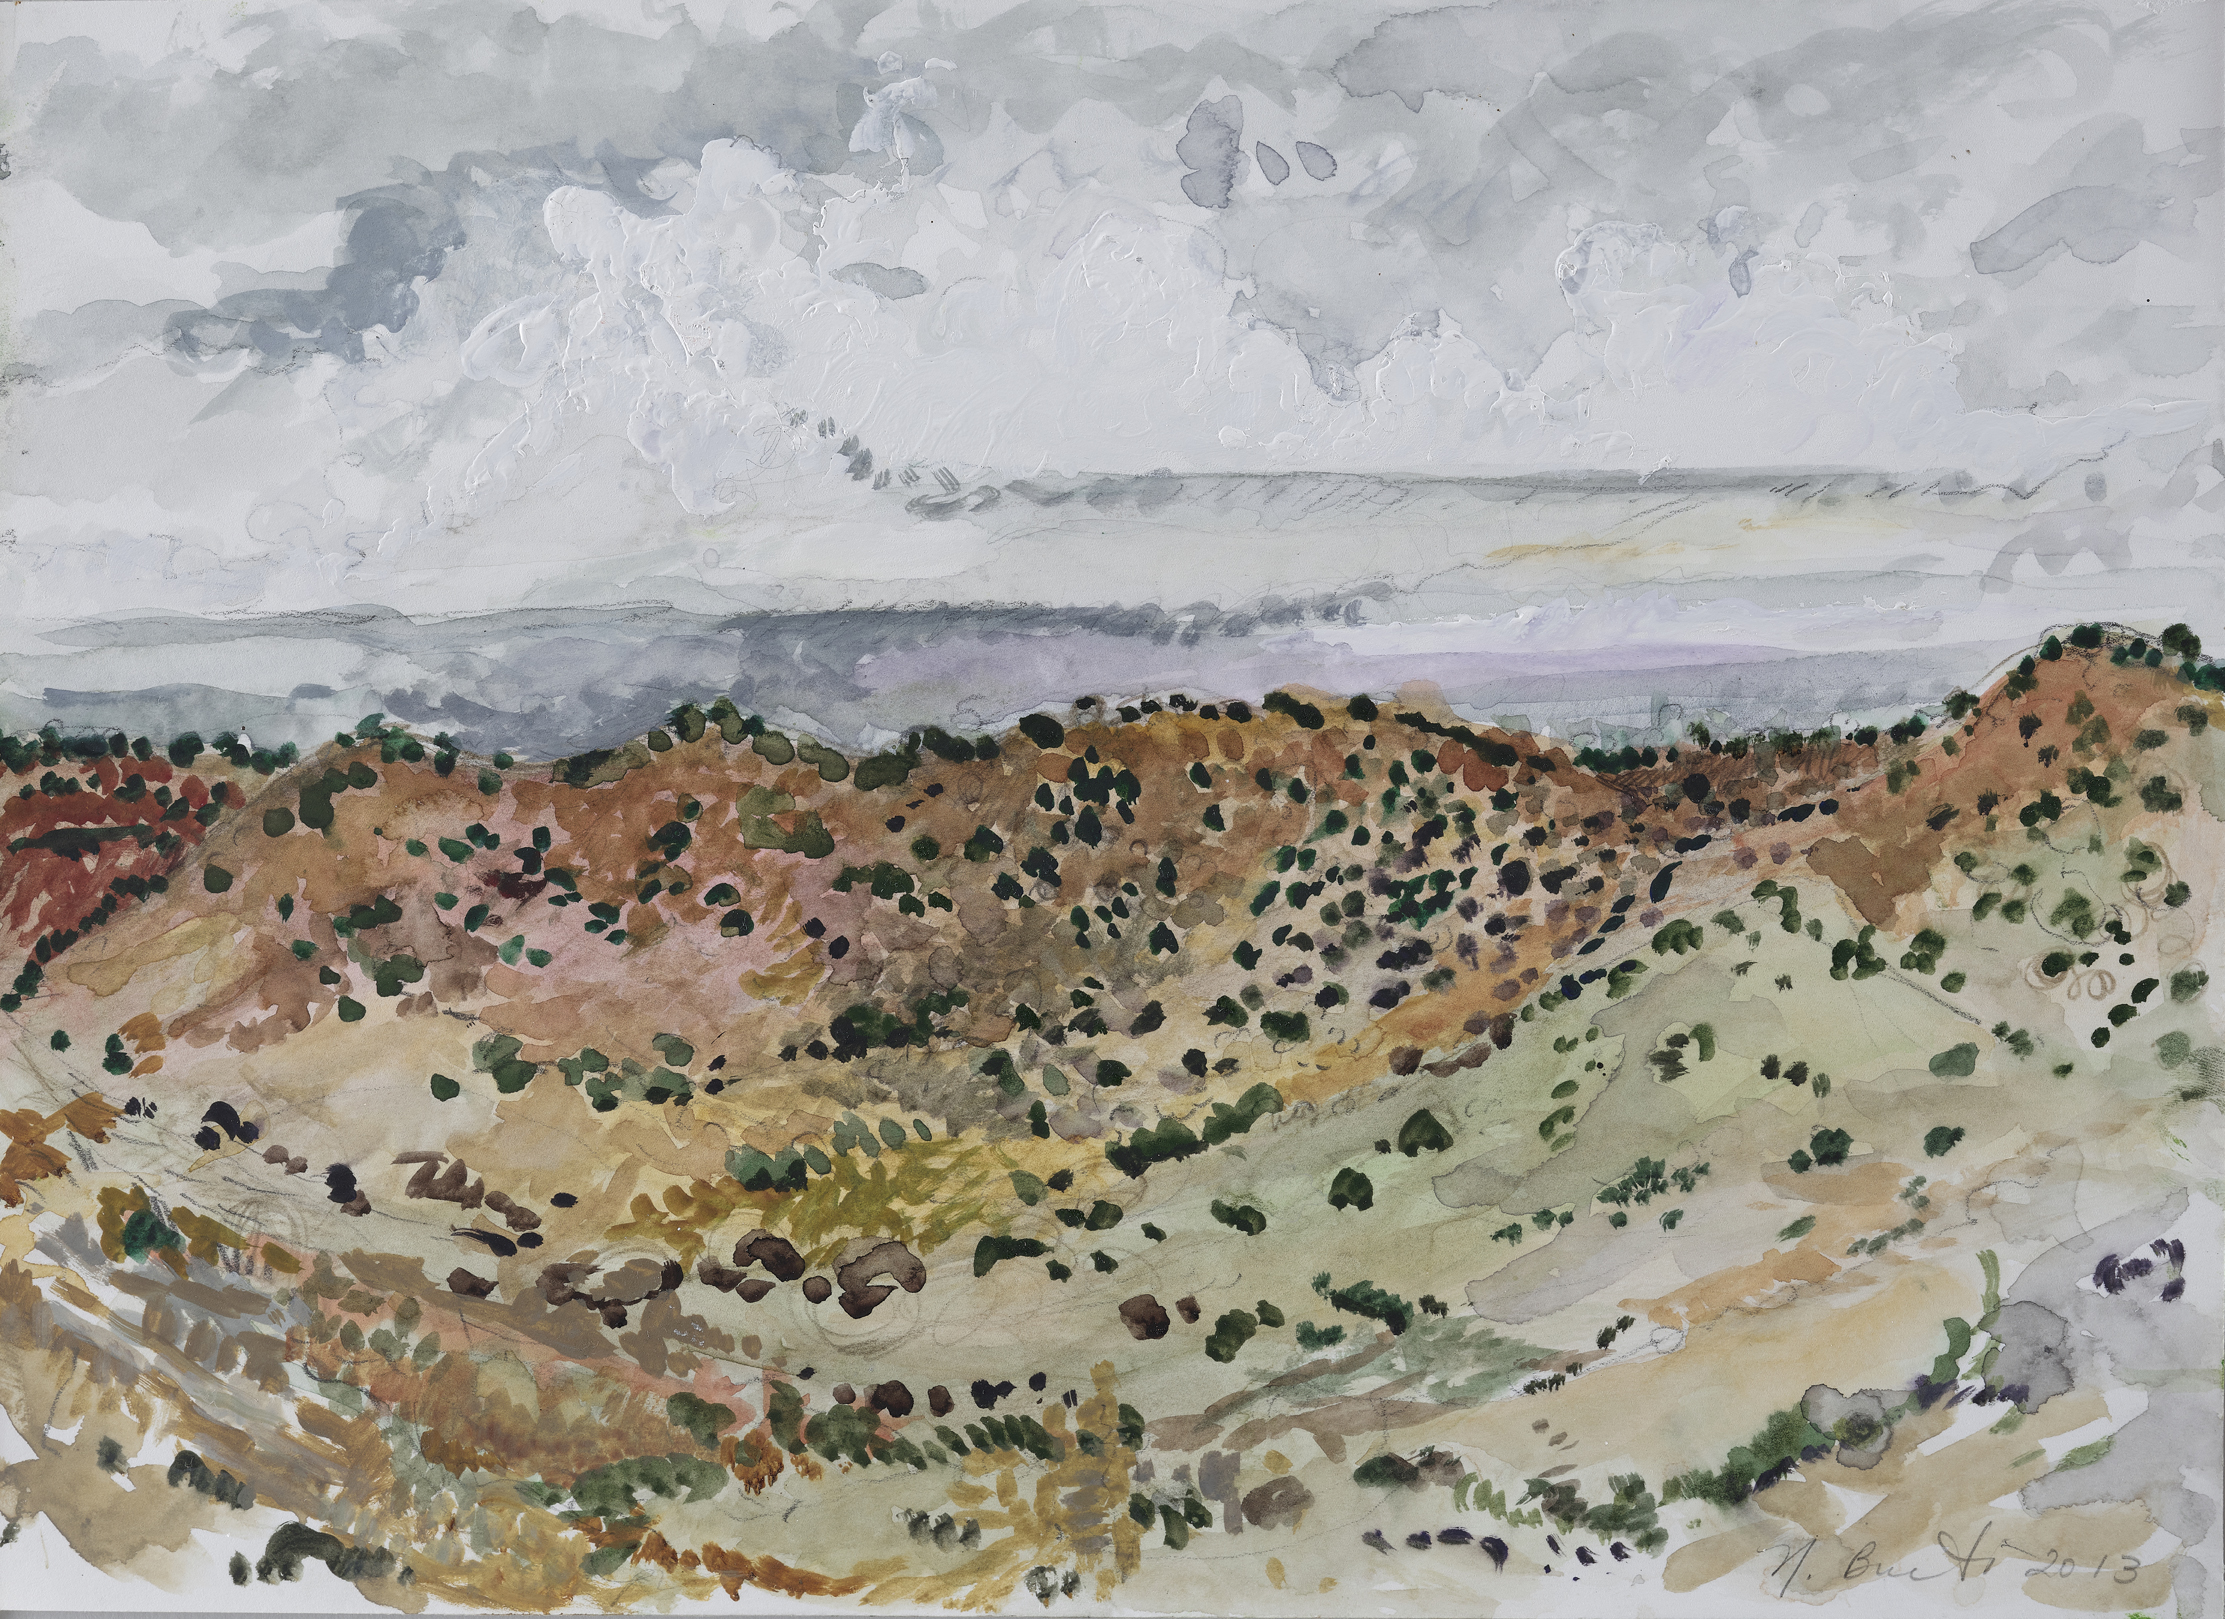 New Mexico near Santa Fe  10x14-gouche on paper